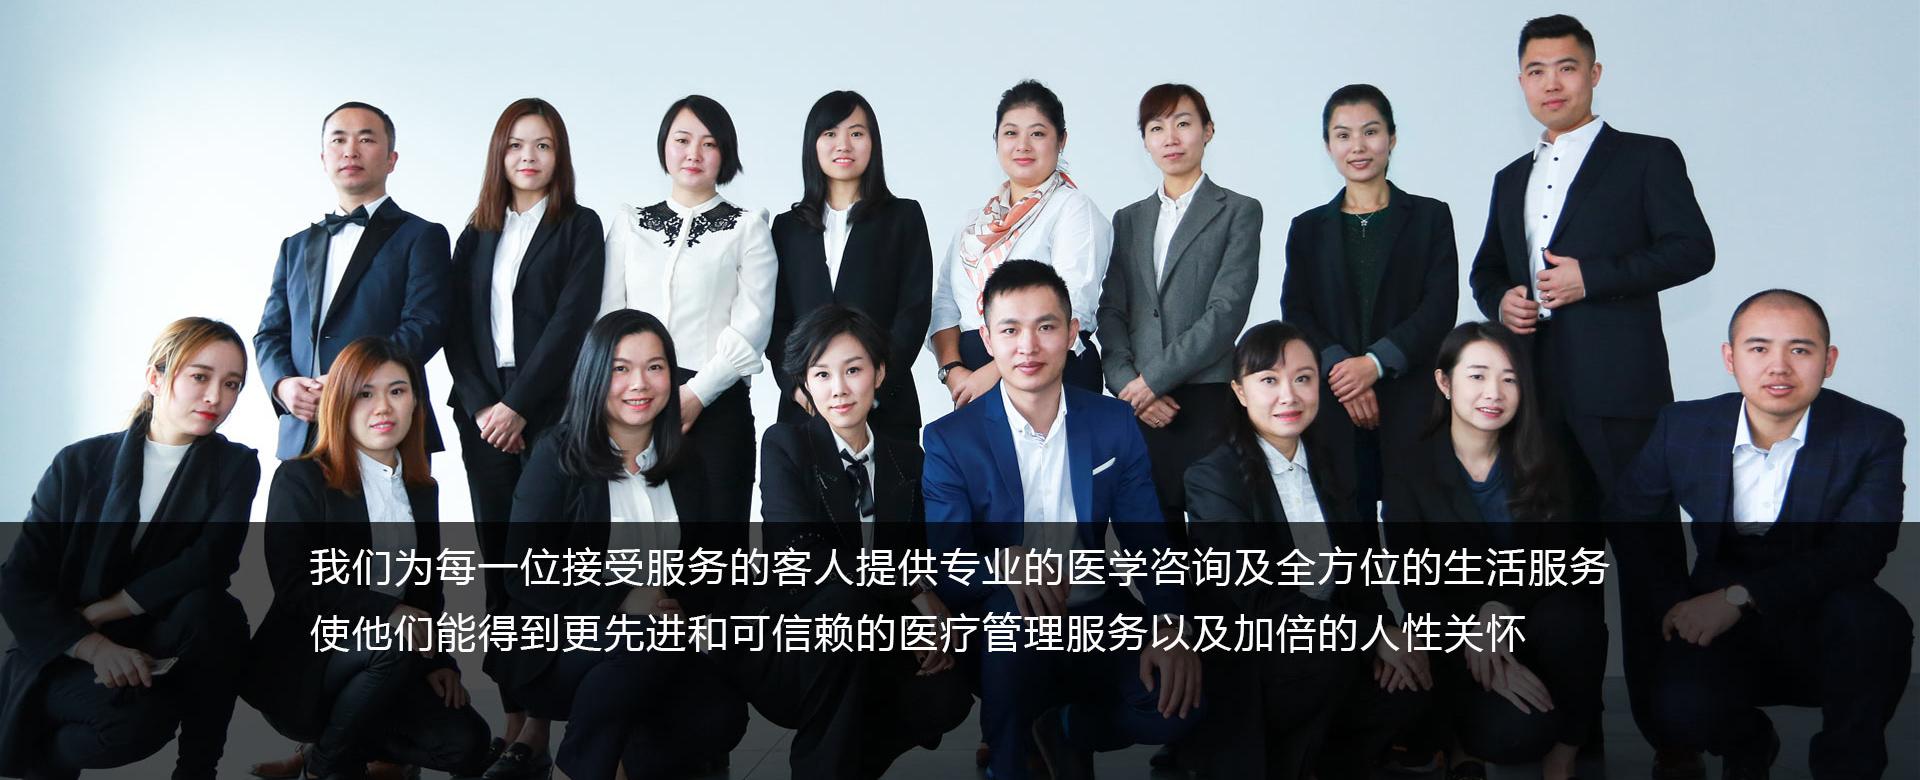 好孕天使(上海)辅助生殖机构